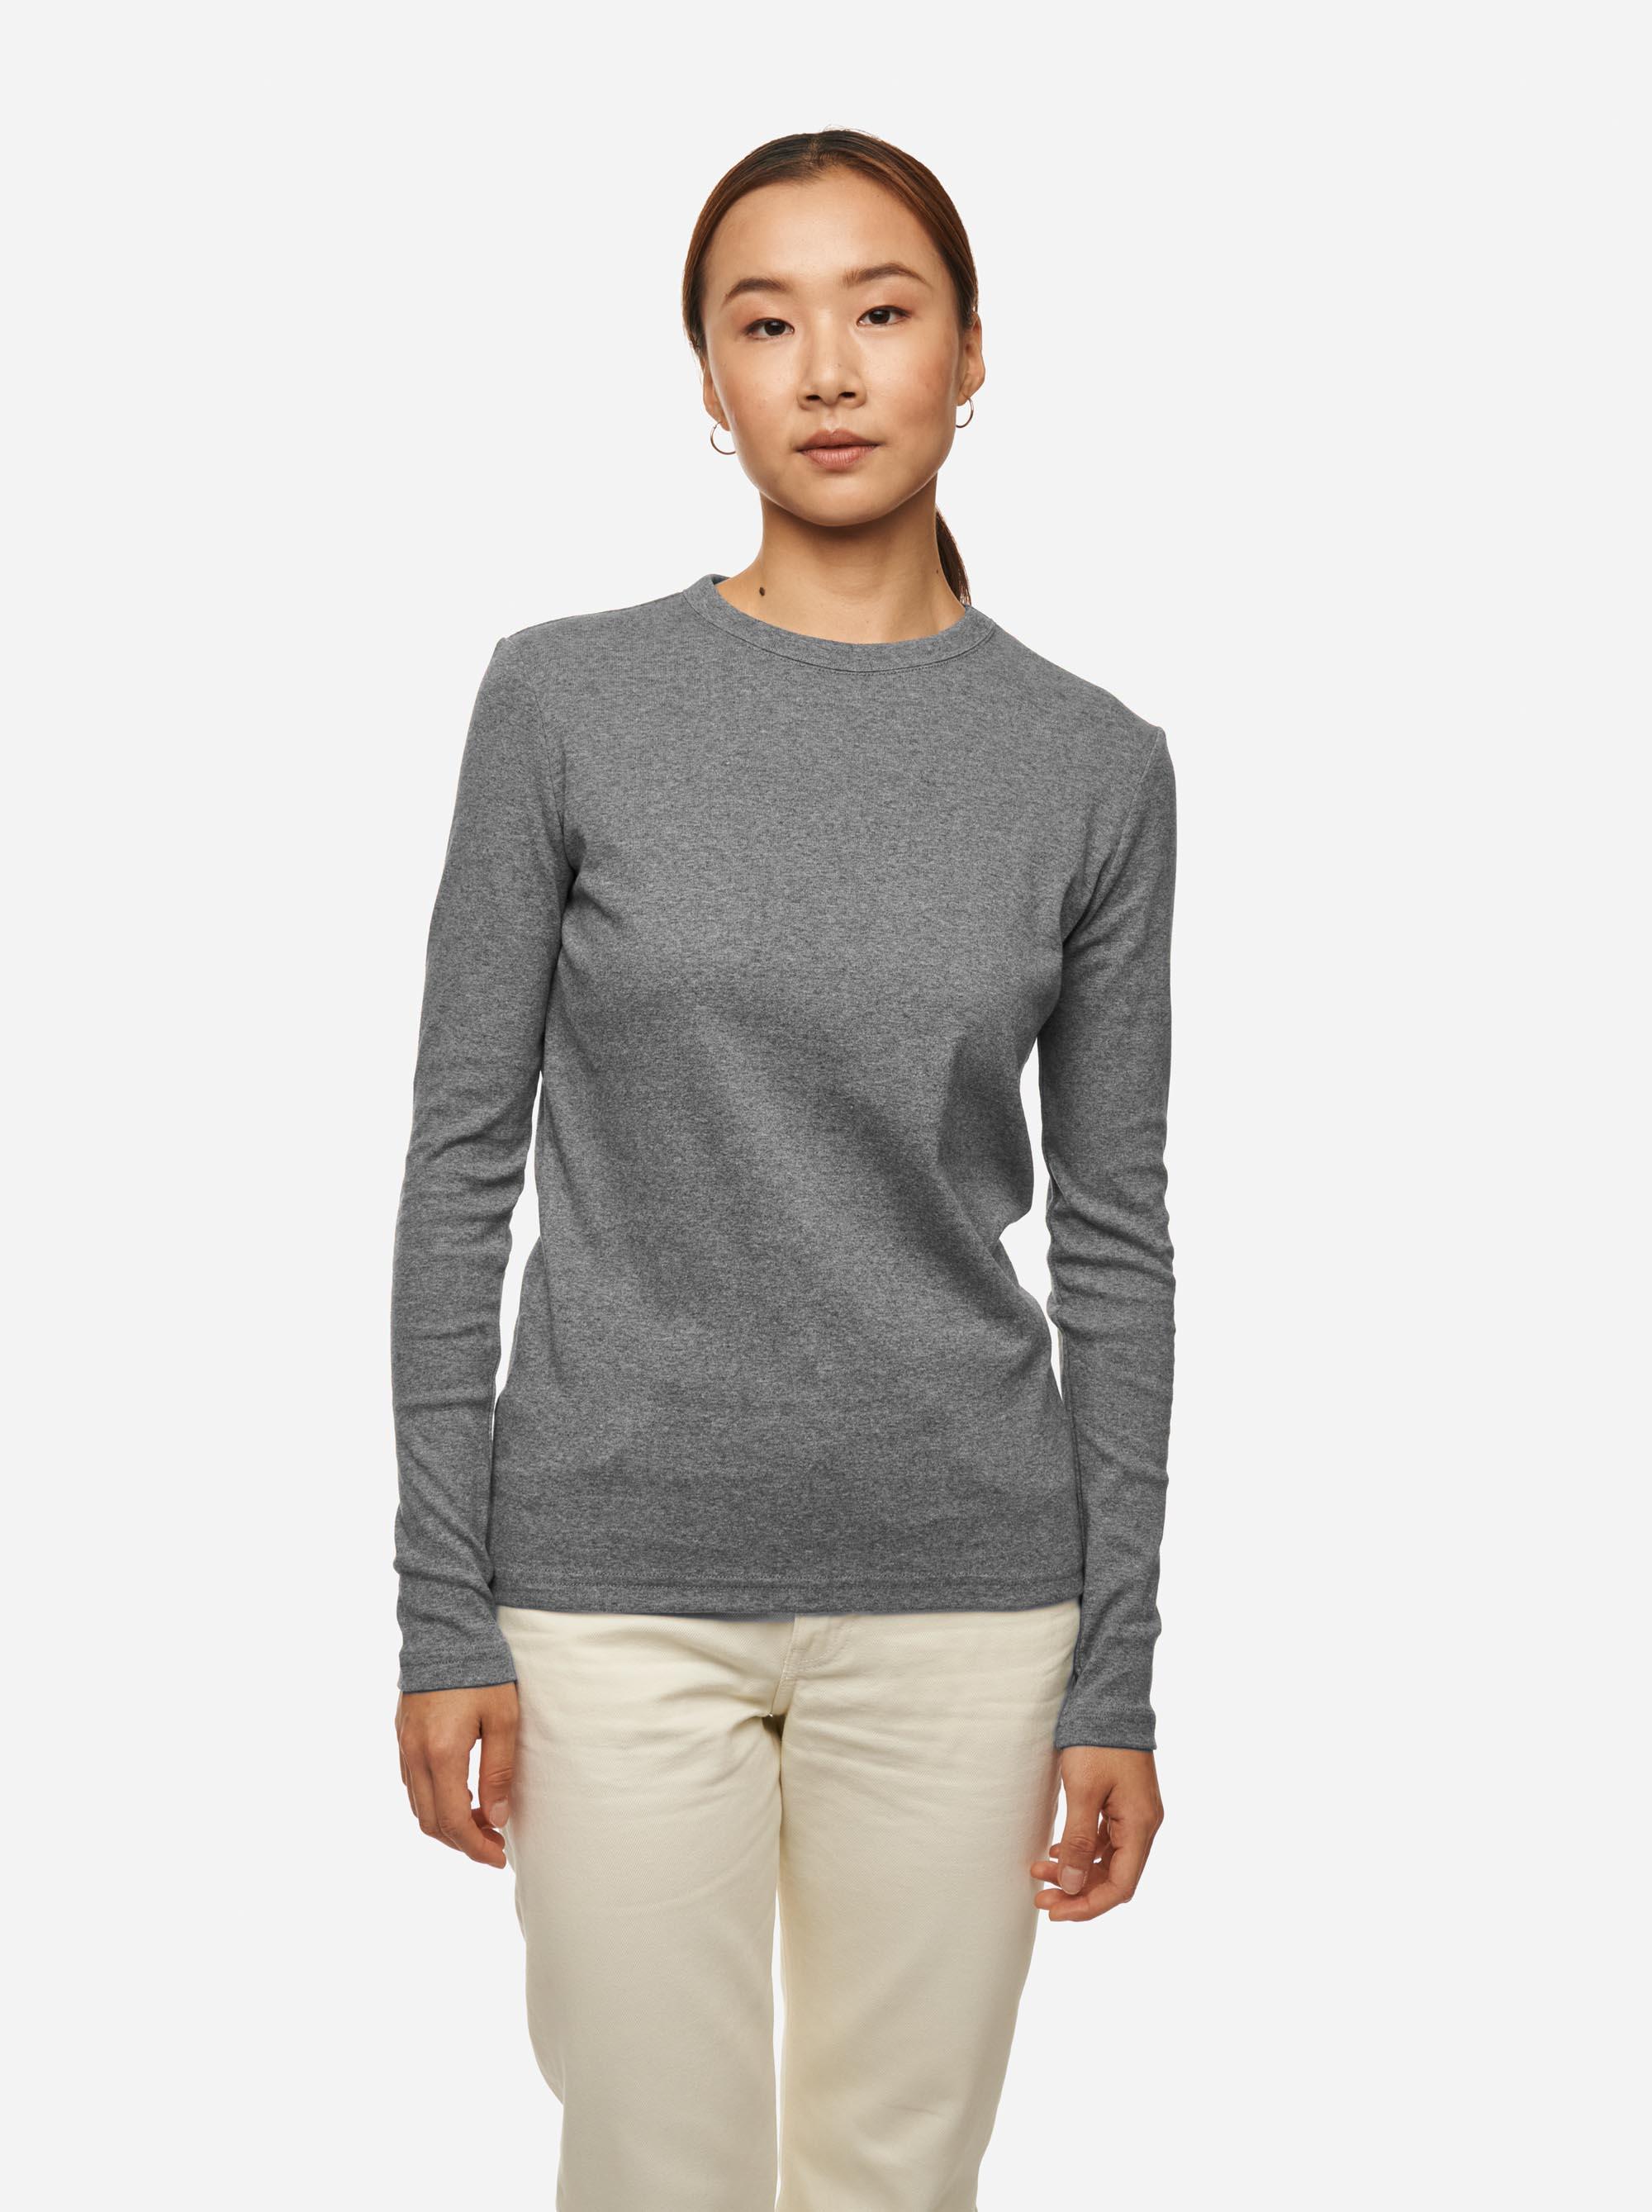 Teym - The-T-Shirt - Longsleeve - Women - Melange Grey - 1B